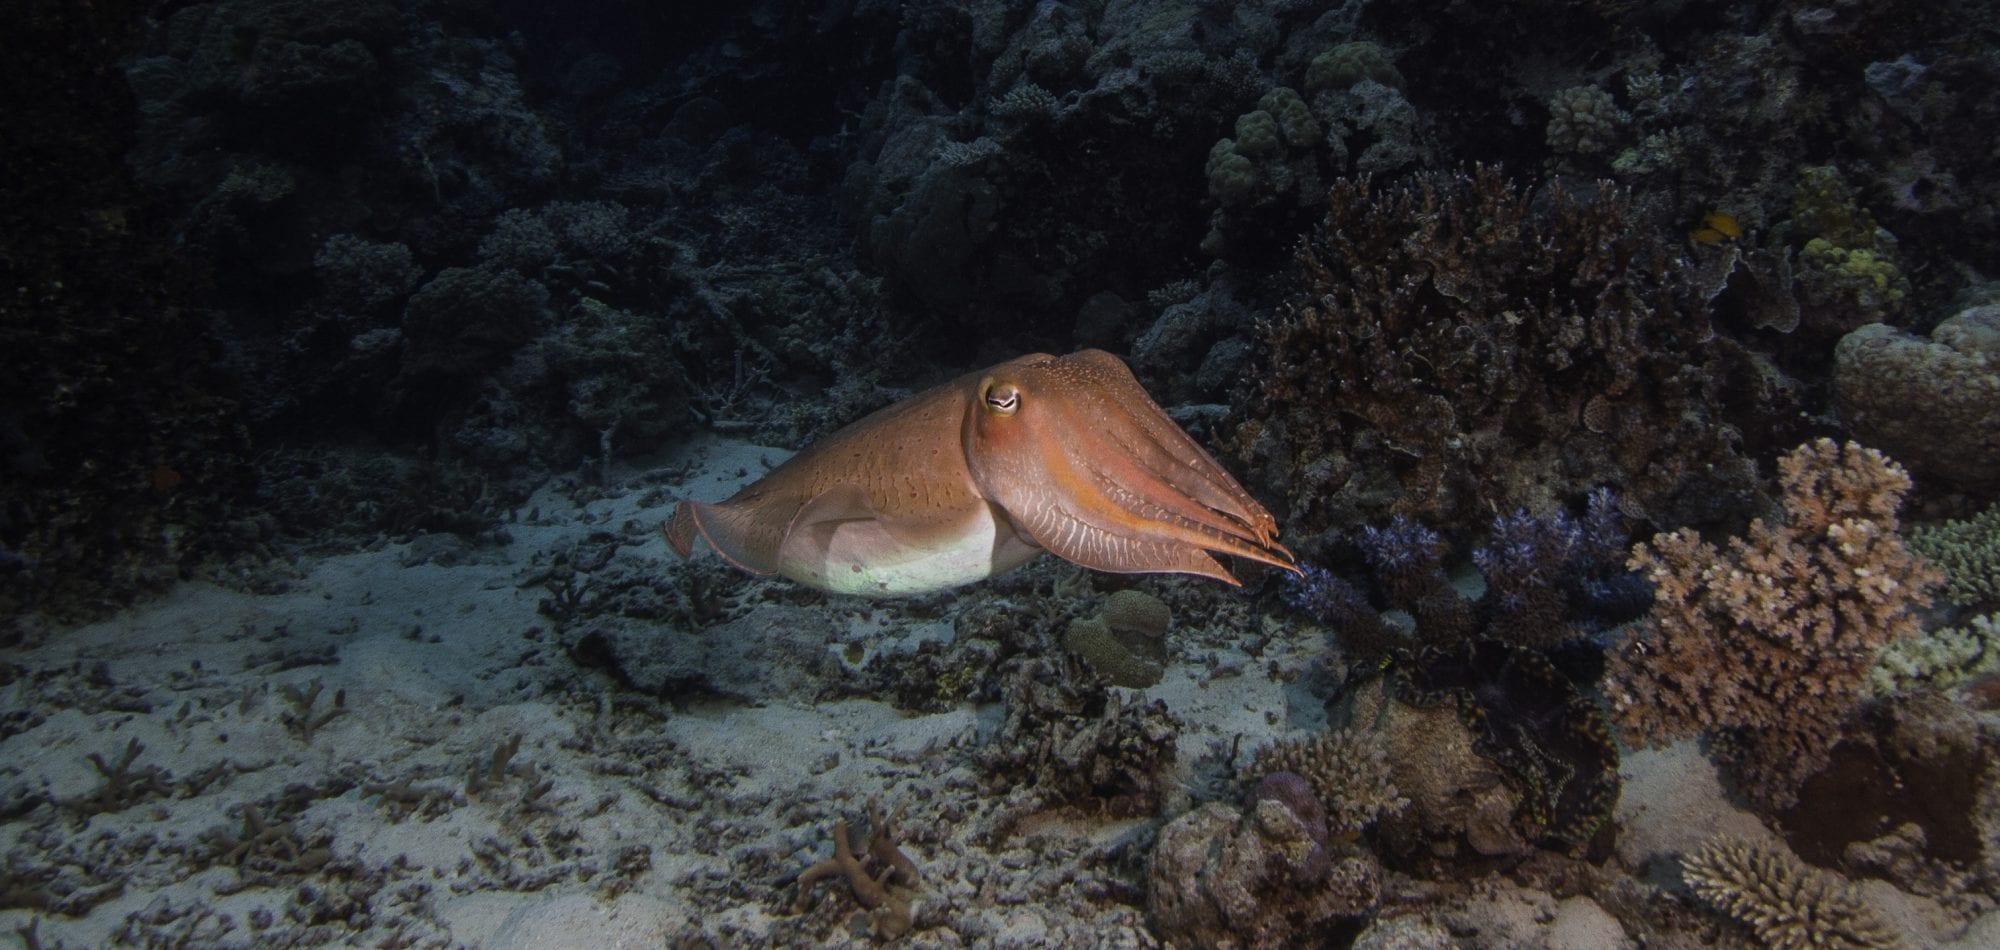 Ribbon Reefs scuba diving holiday - Cuttlefish